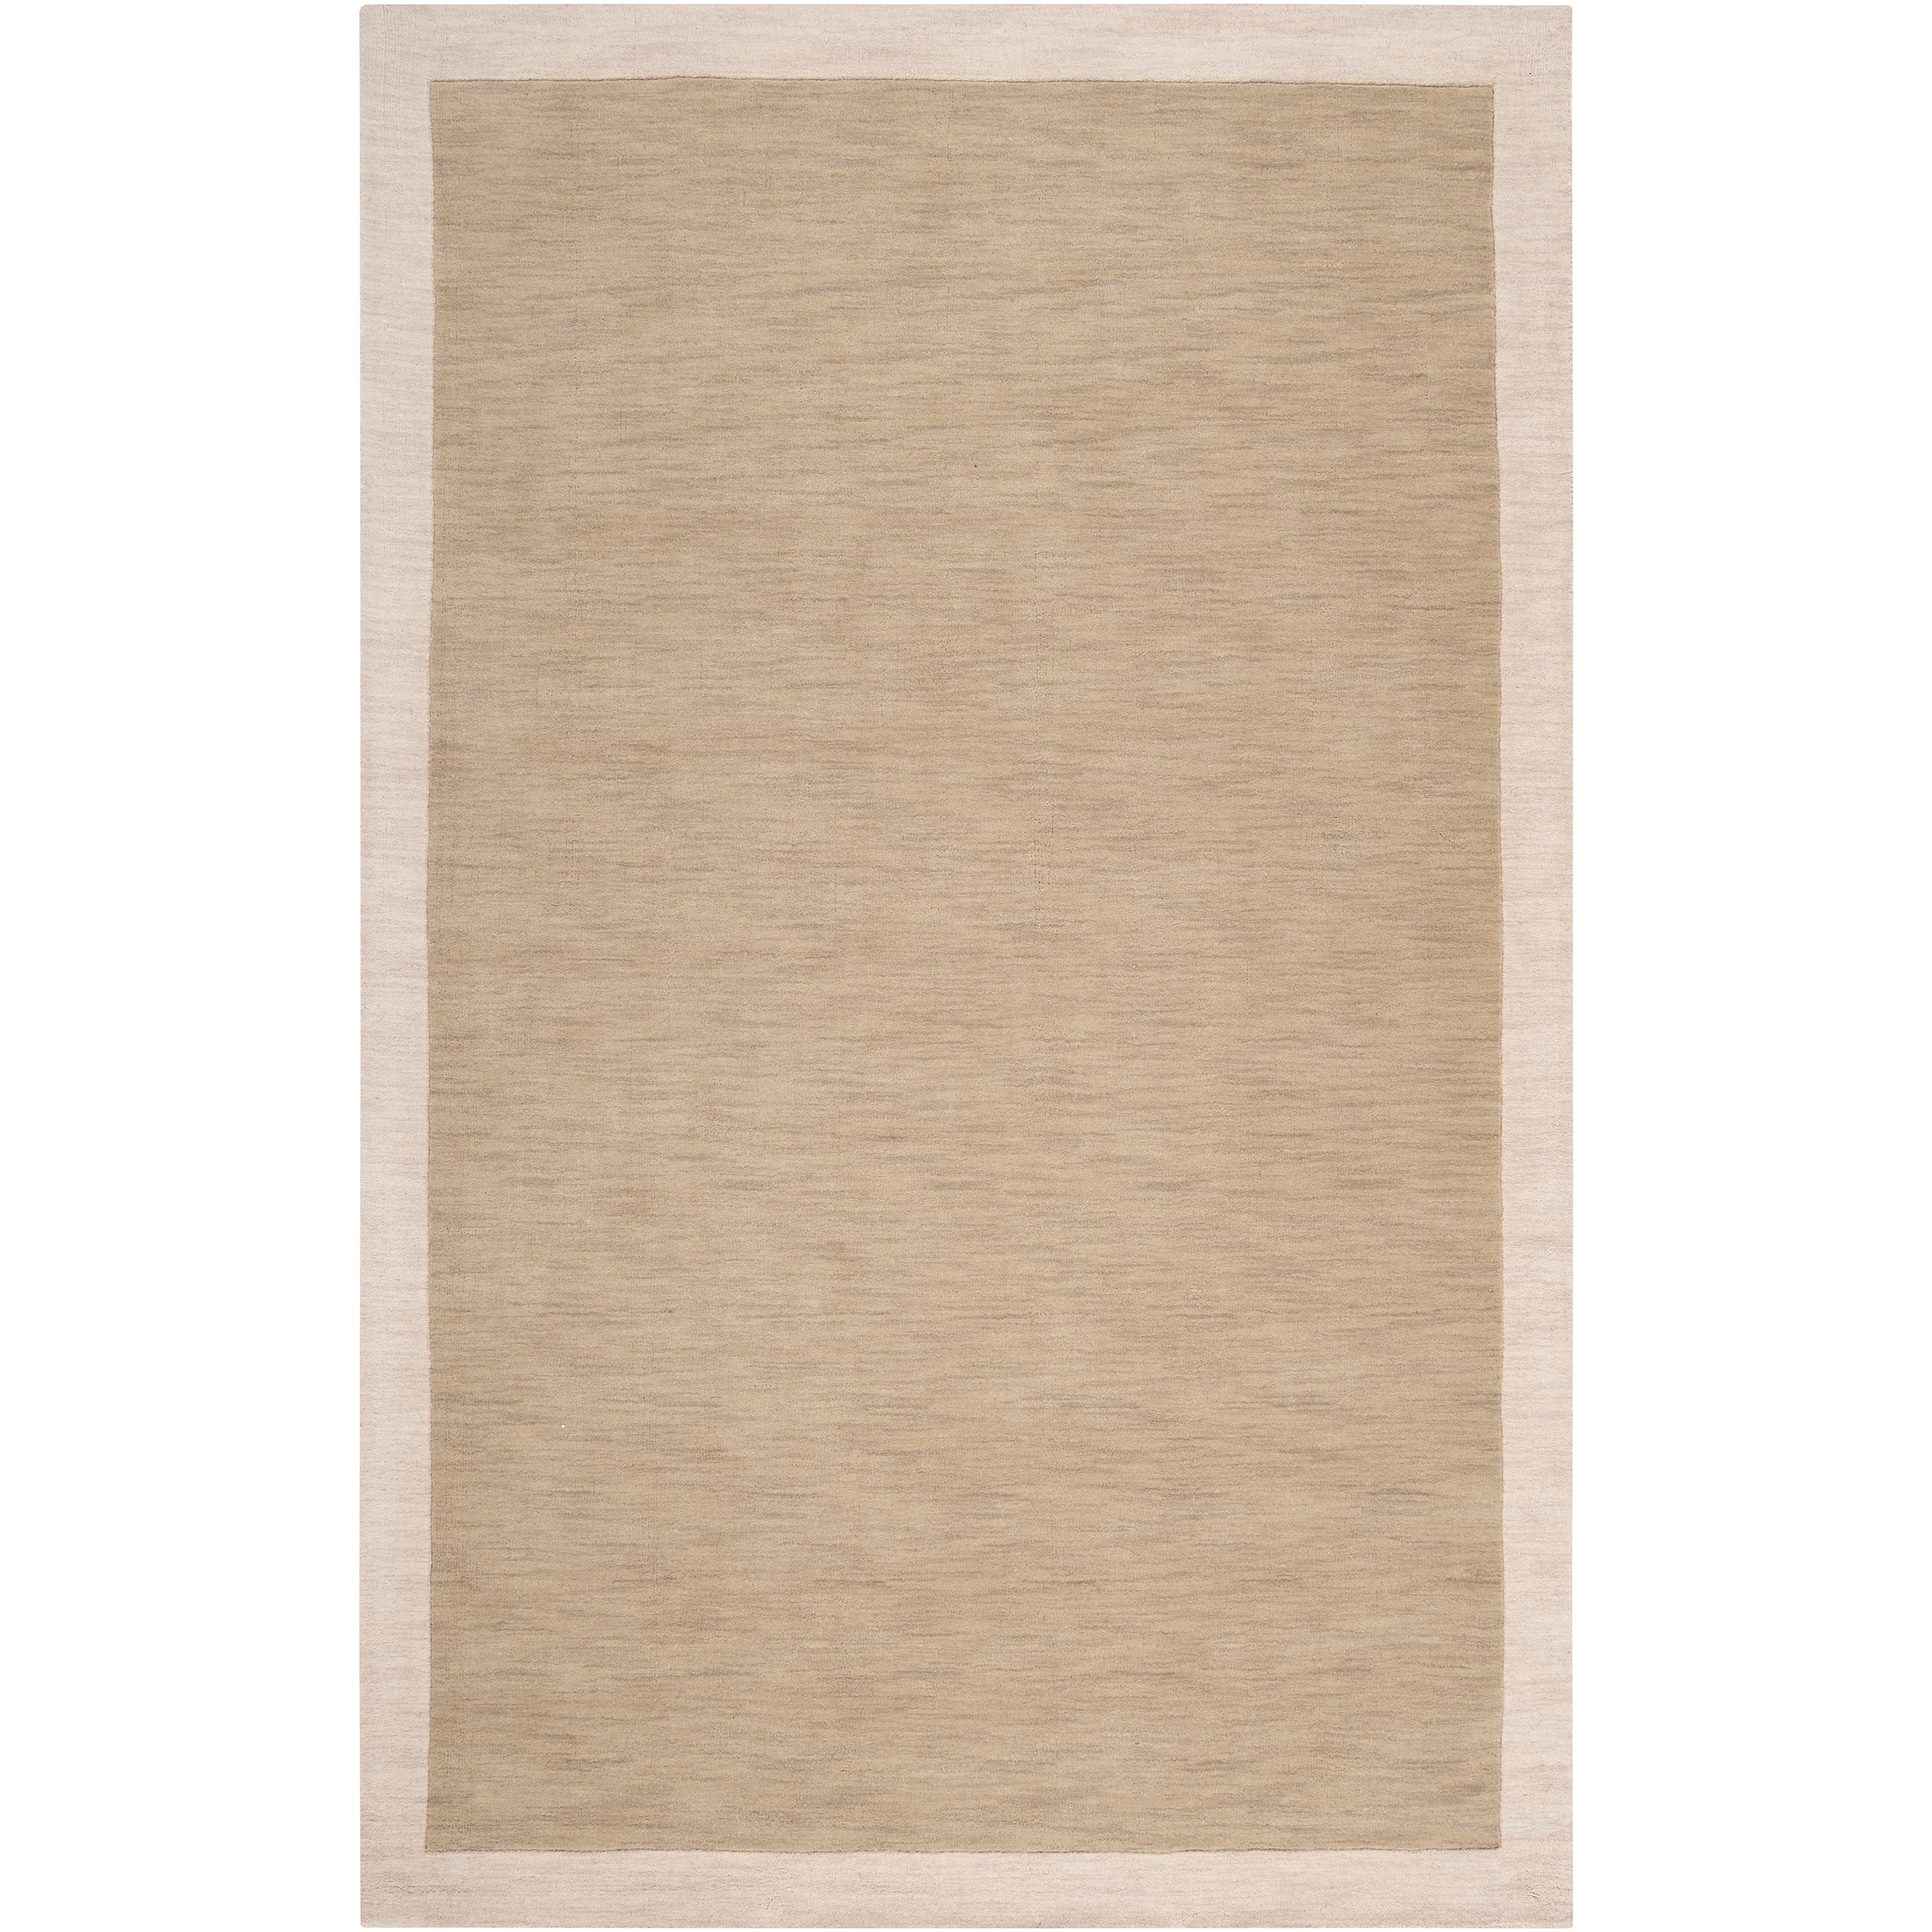 "Loomed Tan Madison Square Wool Area Rug - 5' x 7'6"""